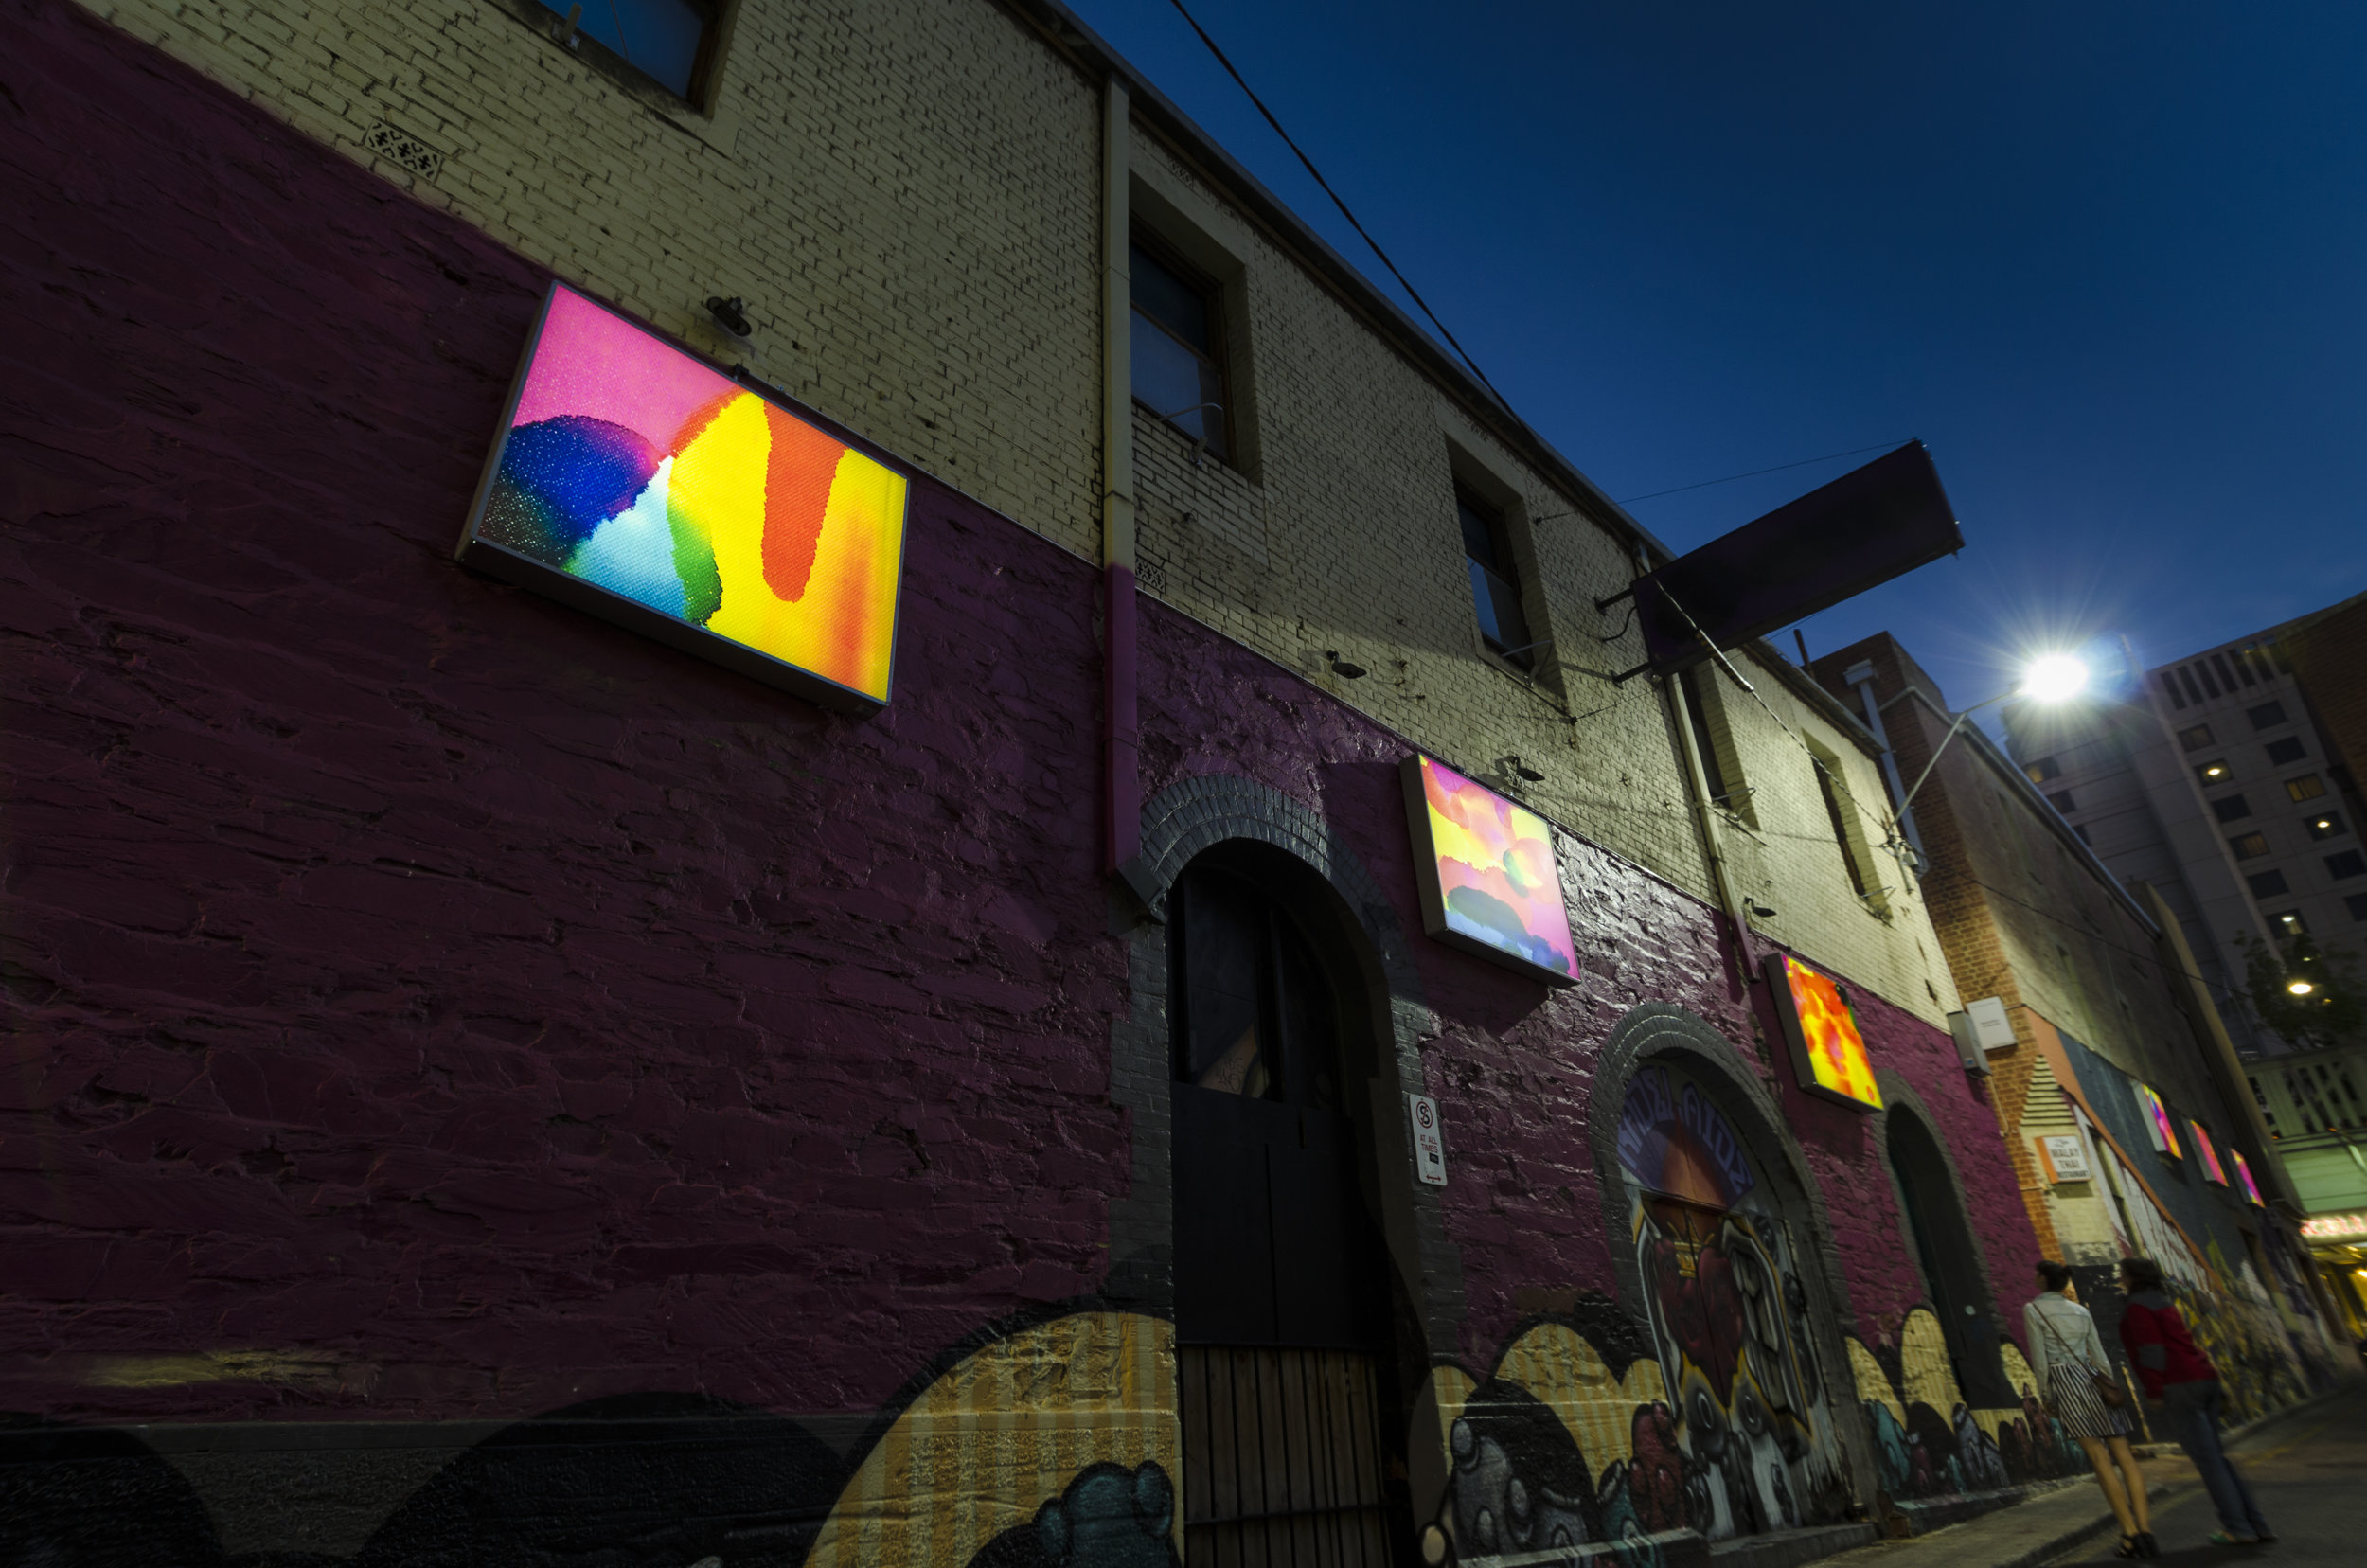 Blyth Street Light Box Gallery - Photo by Steve Rendoulis.